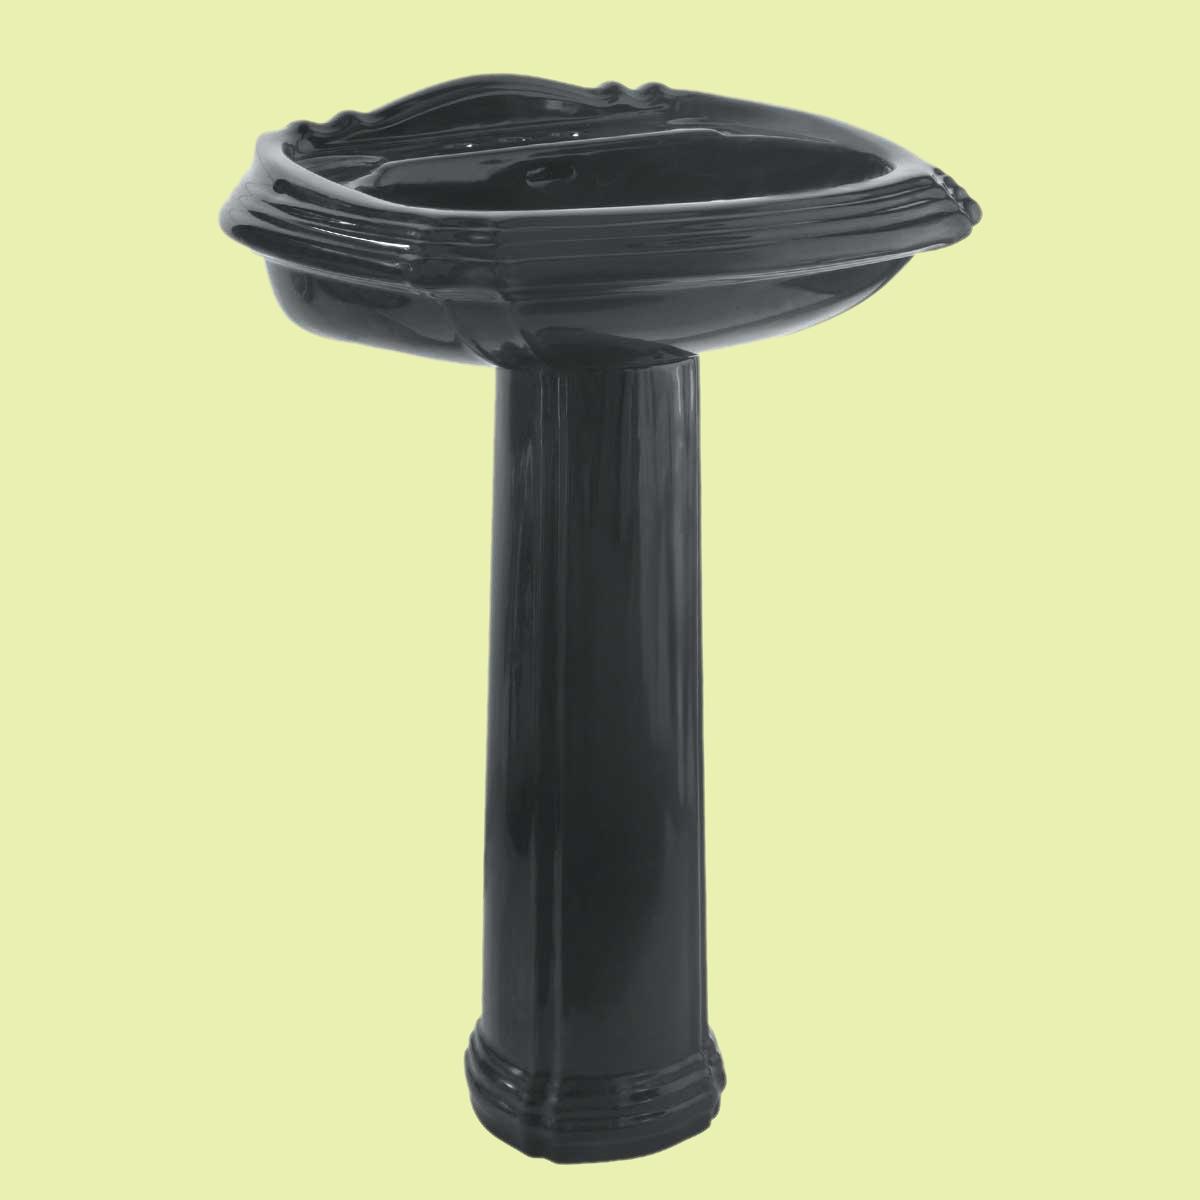 Large Black Ornate Pedestal Sink Grade A Vitreous China